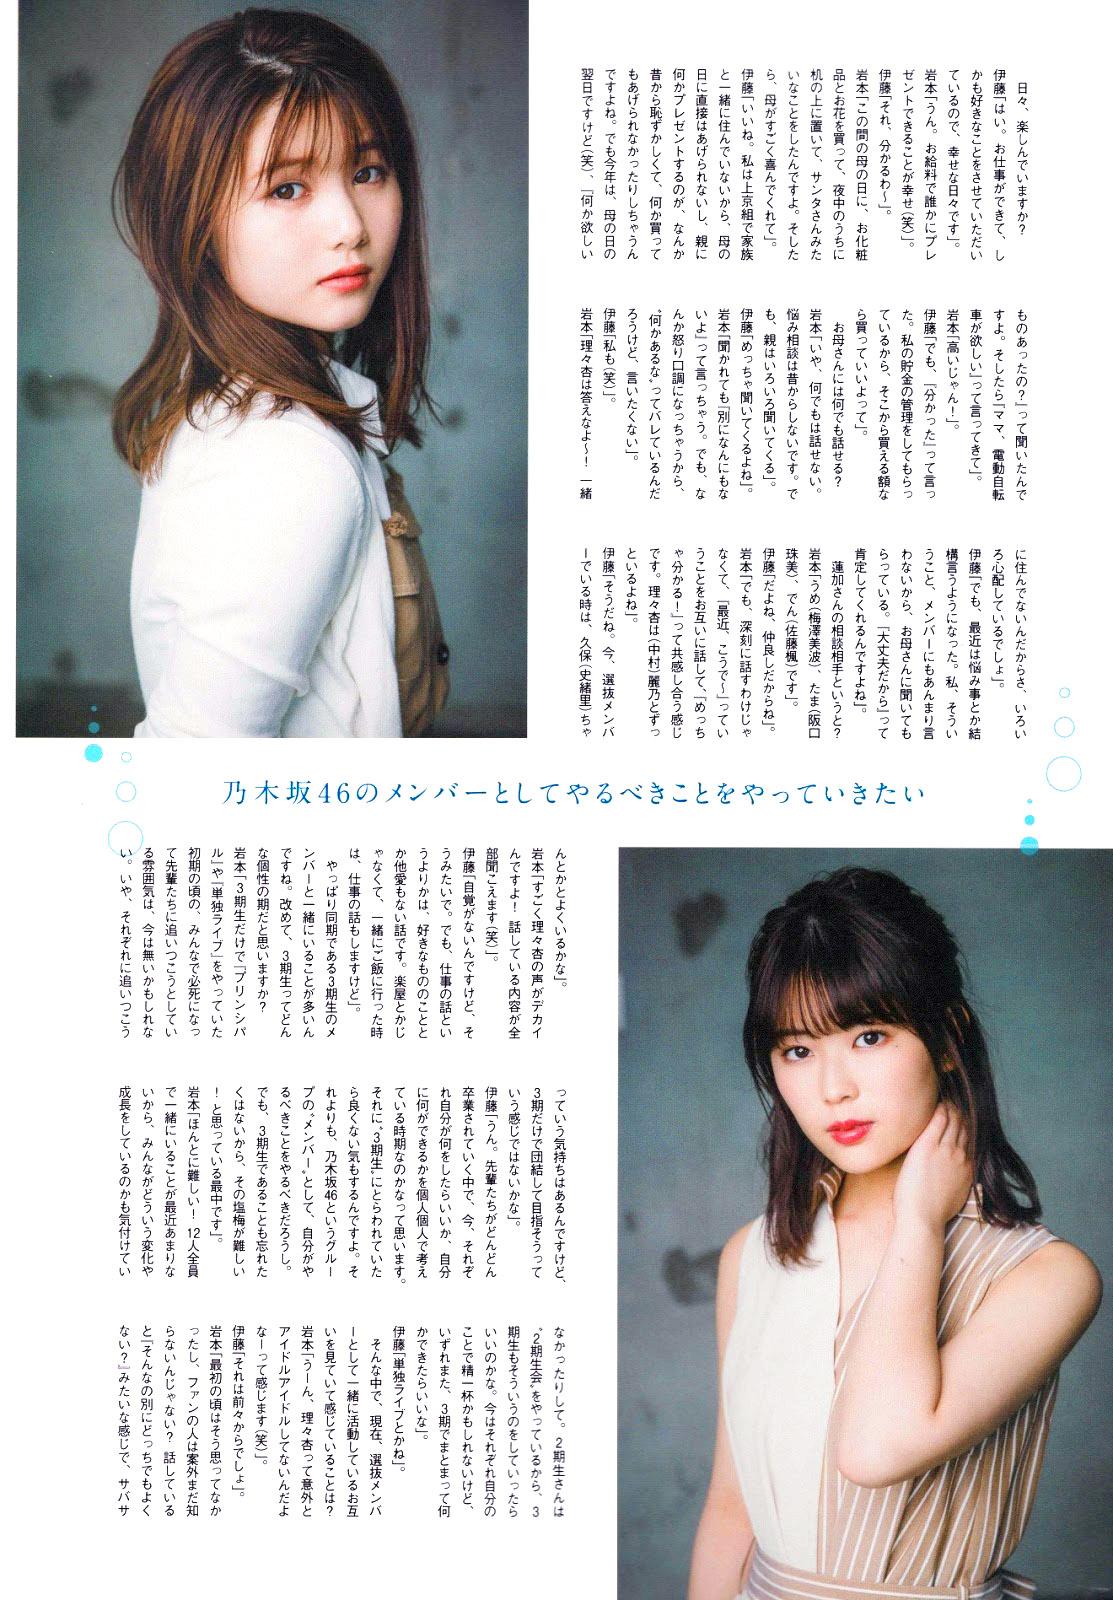 Ito Riria Renka Iwamoto BLT 1908 06.jpg